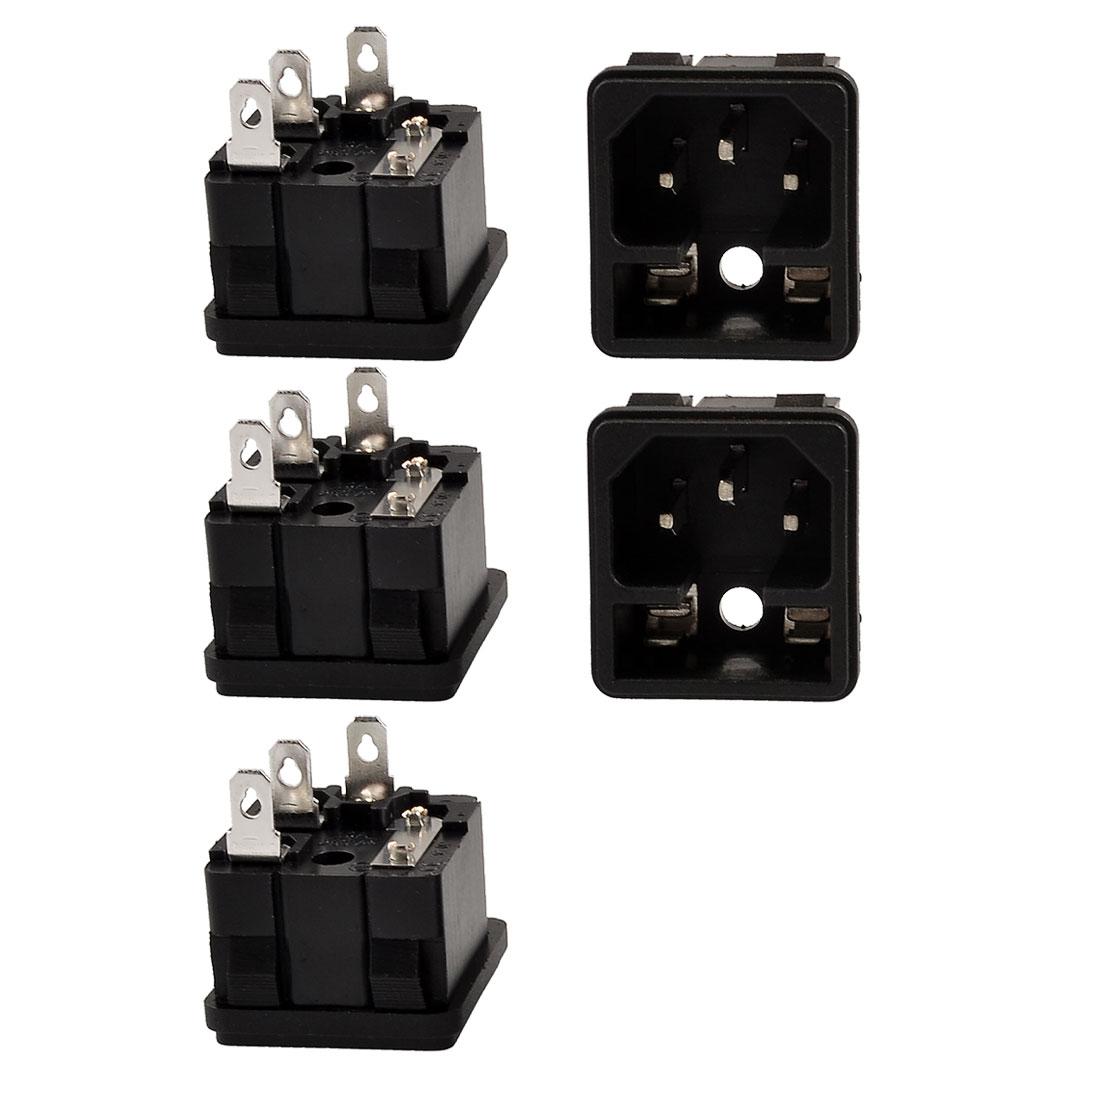 5 Pcs Fuse Holder IEC 320 C14 Inlet AC Power Entry Socket 10A 250V